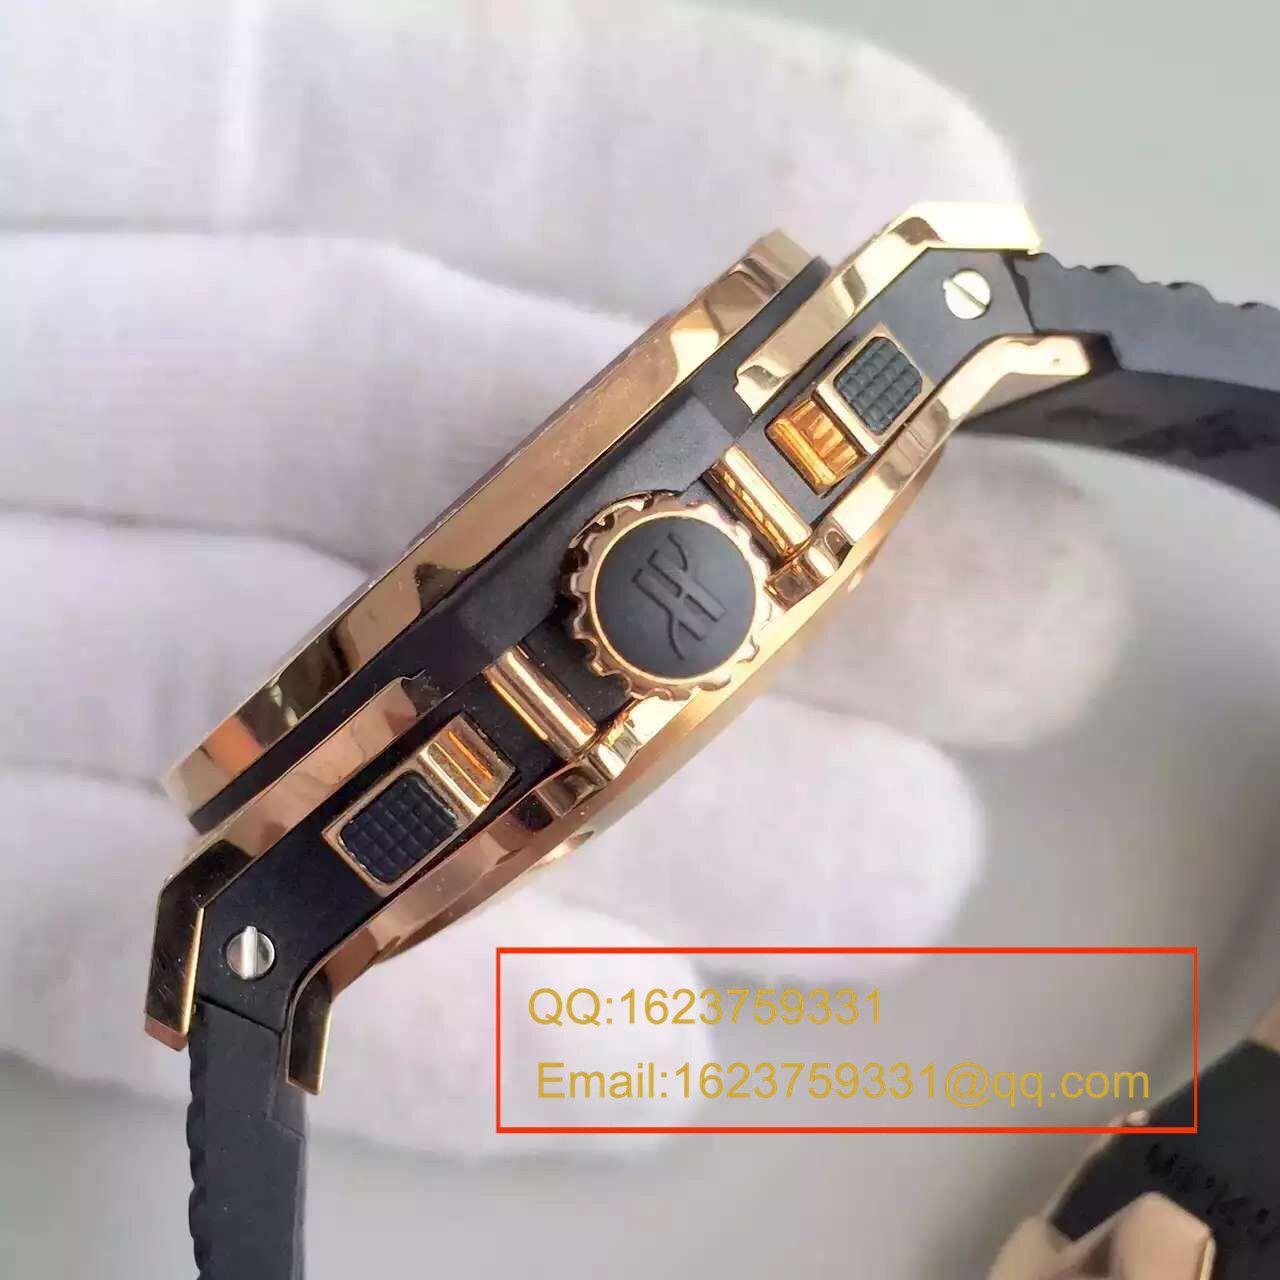 【JF厂1:1精仿手表】宇舶《恒宝》大爆炸系列341.PX.9010.RX.1704机械手表 / YB004